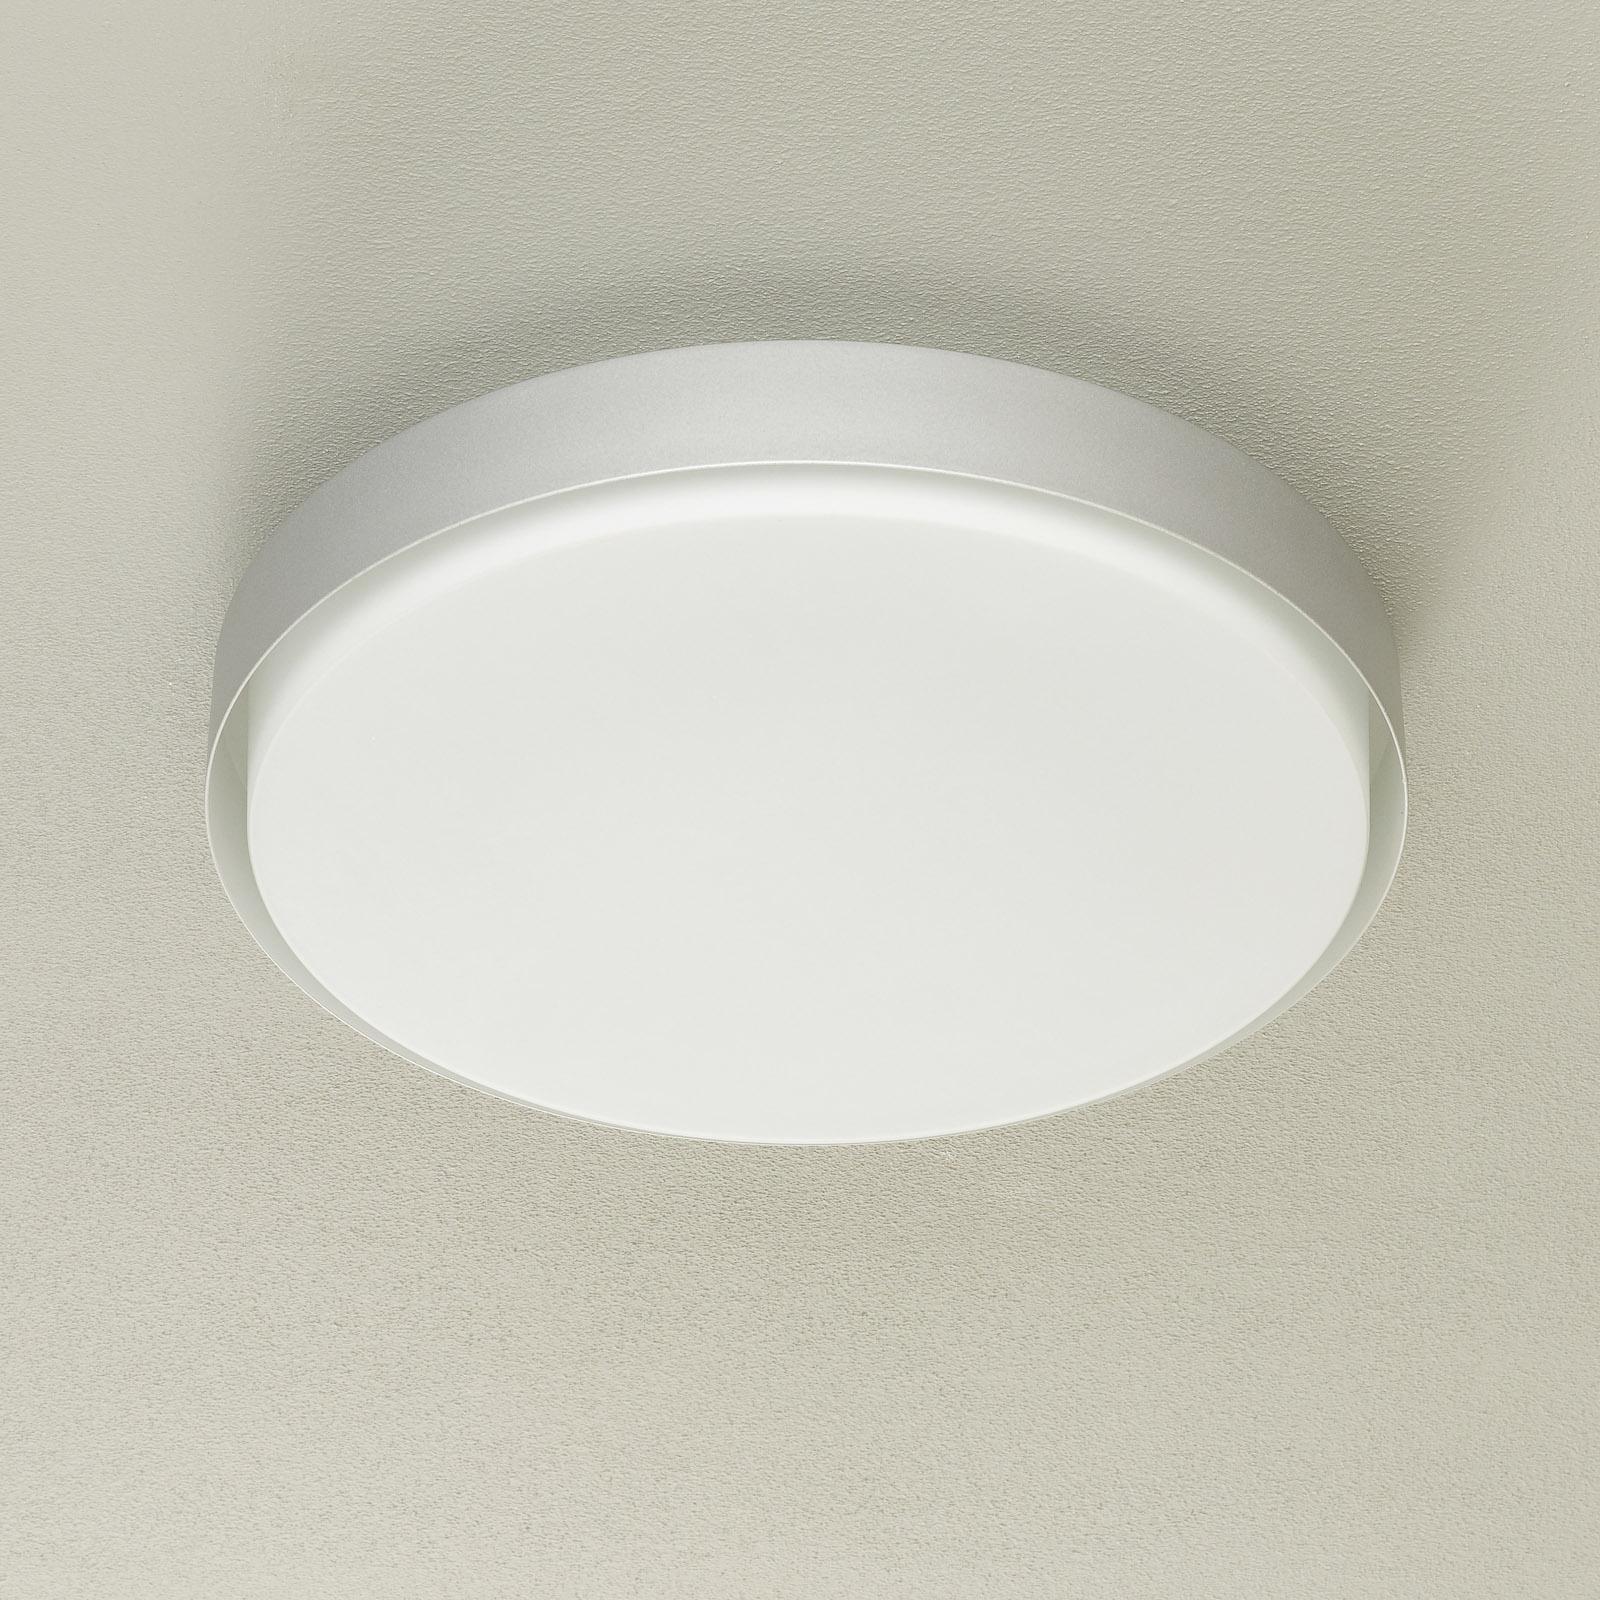 BEGA 12165 plafonnier LED, alu, Ø 50cm, DALI